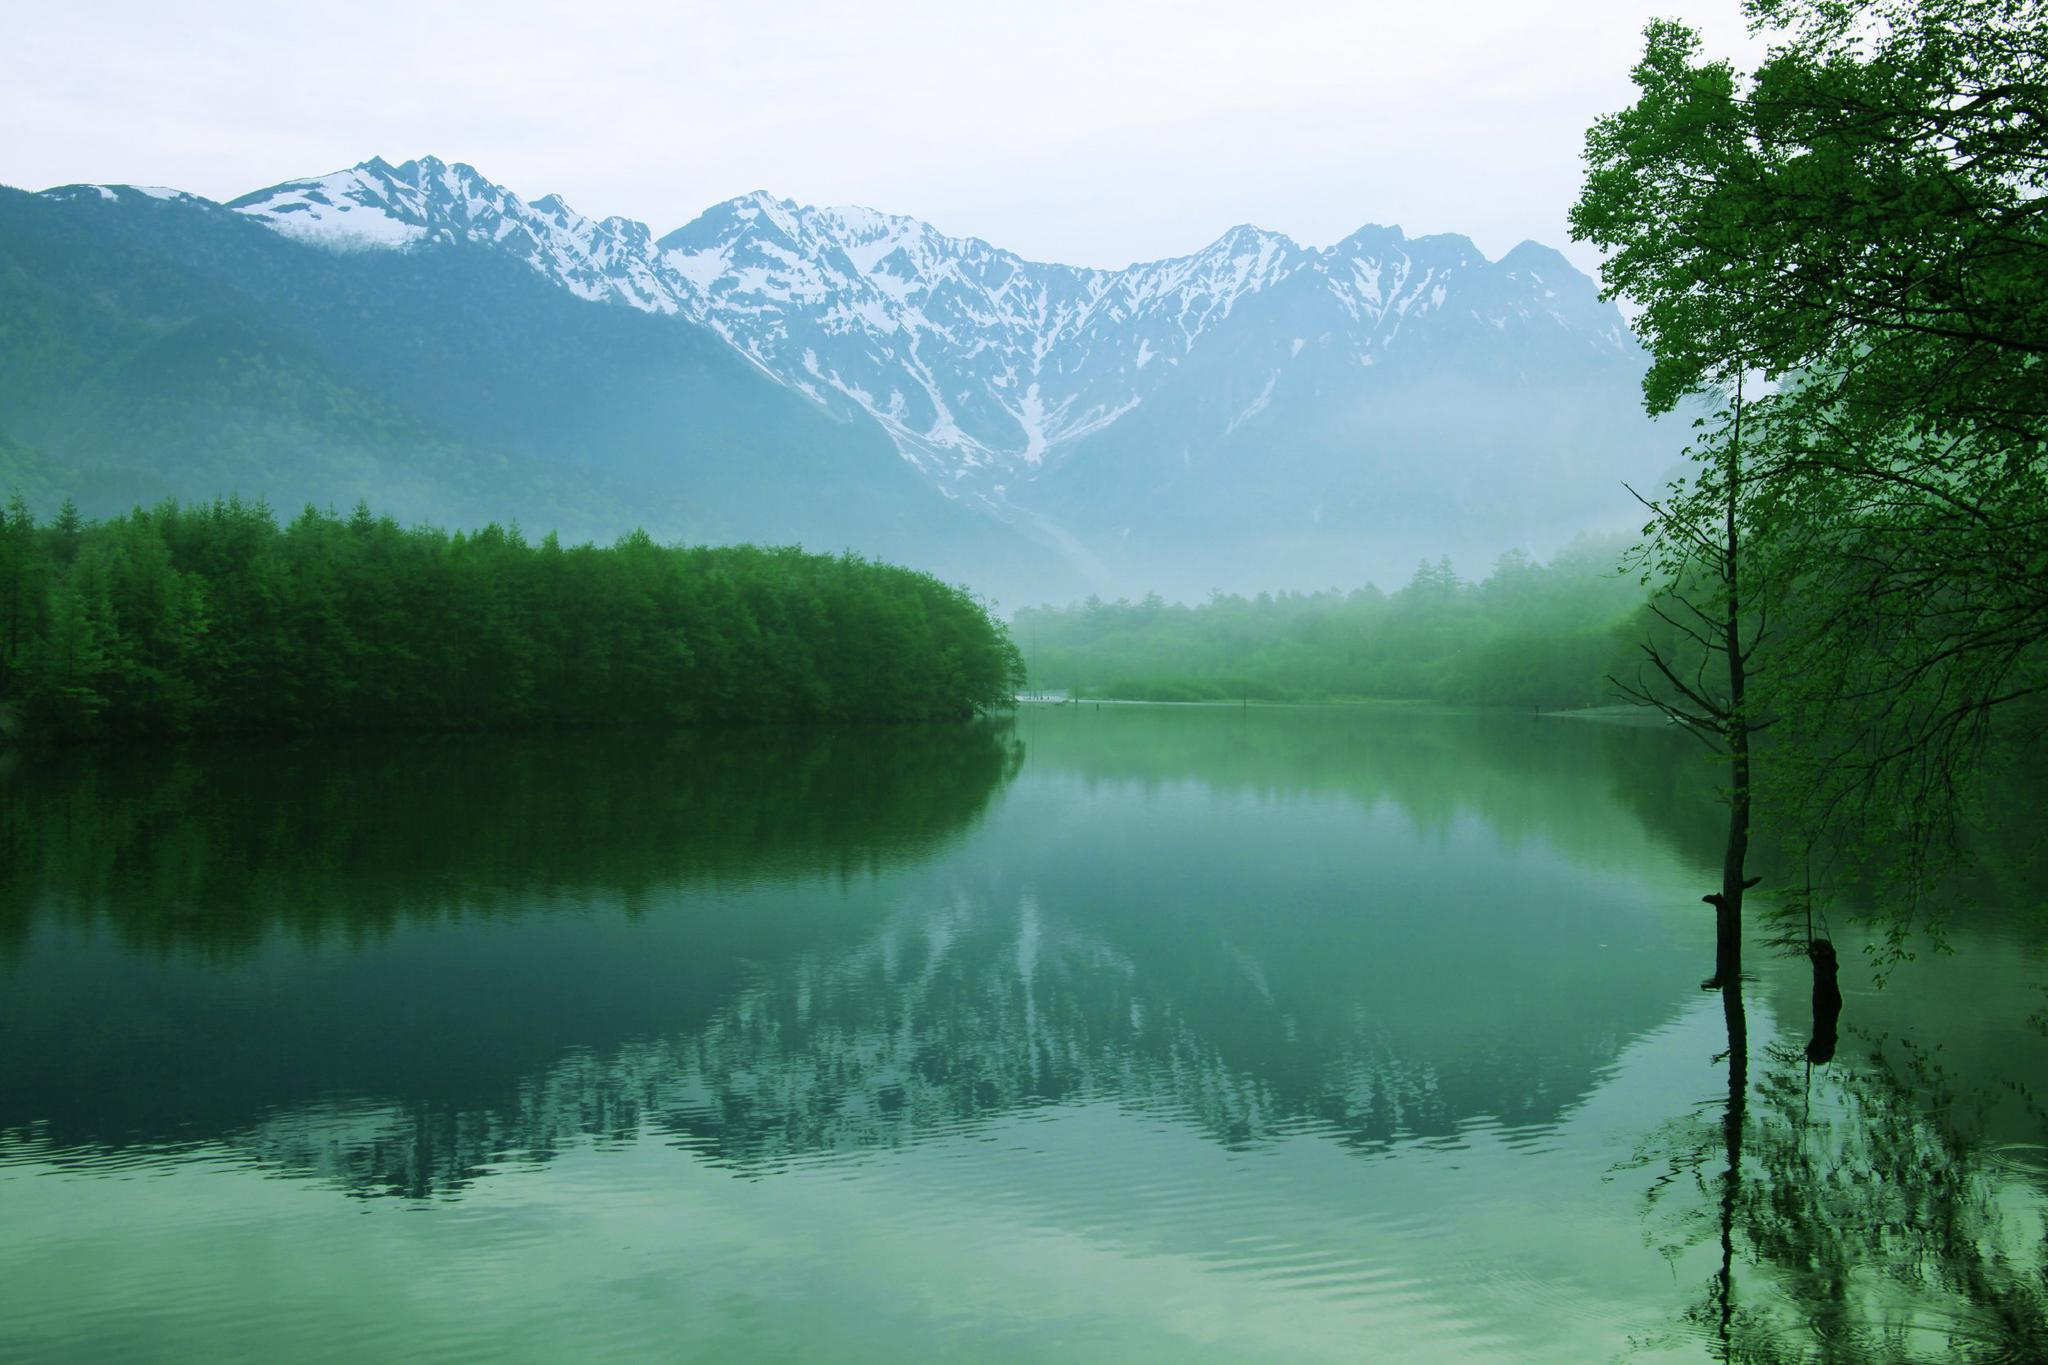 The Taisho Pond and Mount Hotaka in Japan's Koshinetsu region.